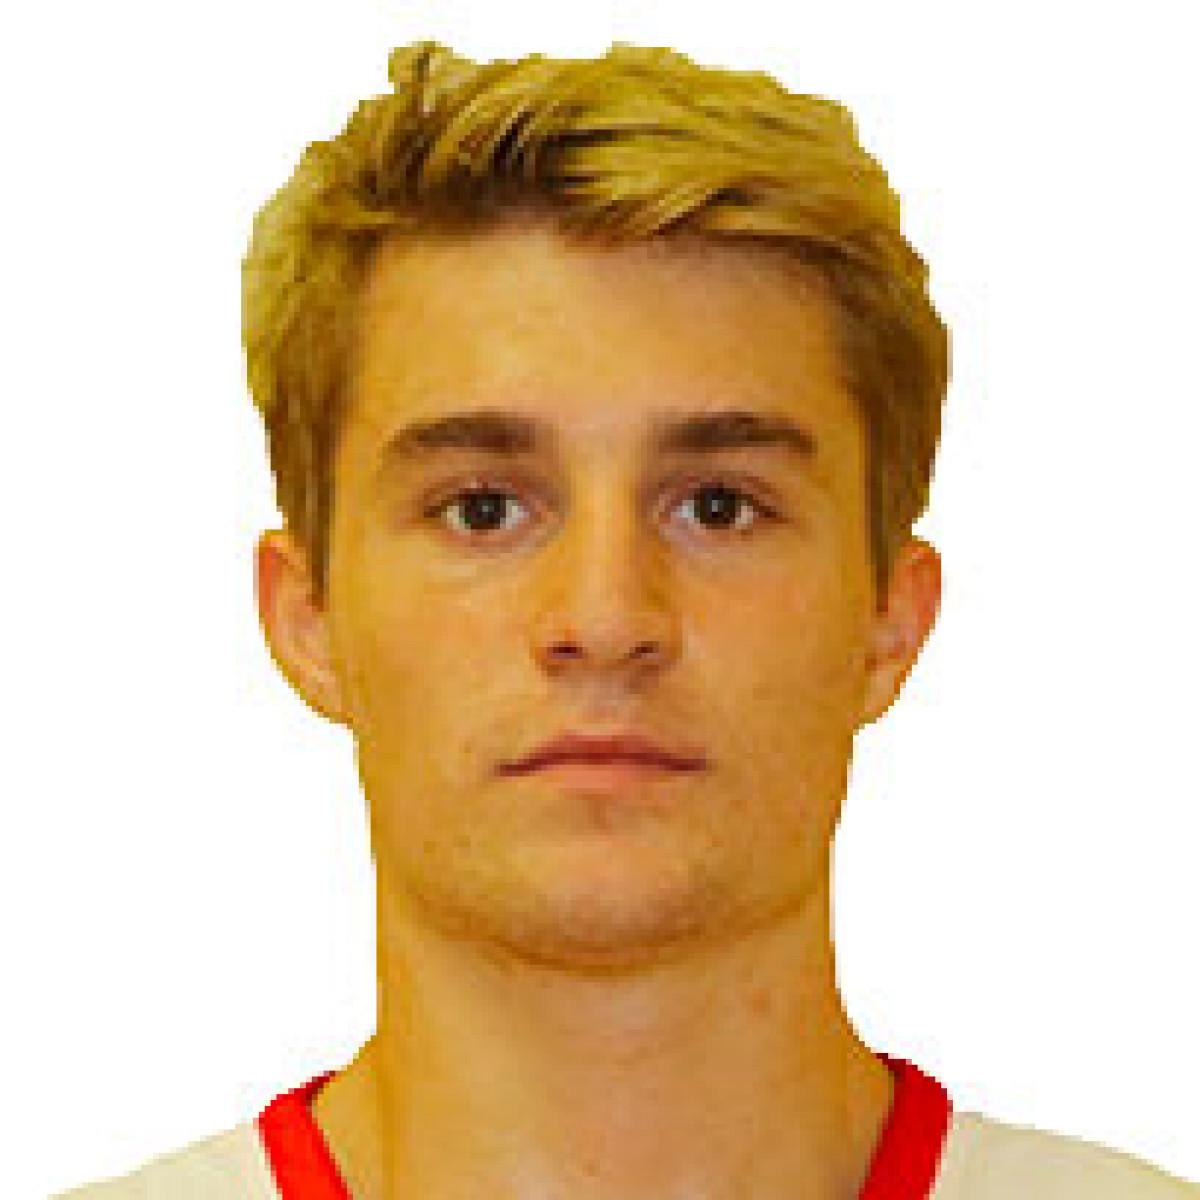 Nils Gasser